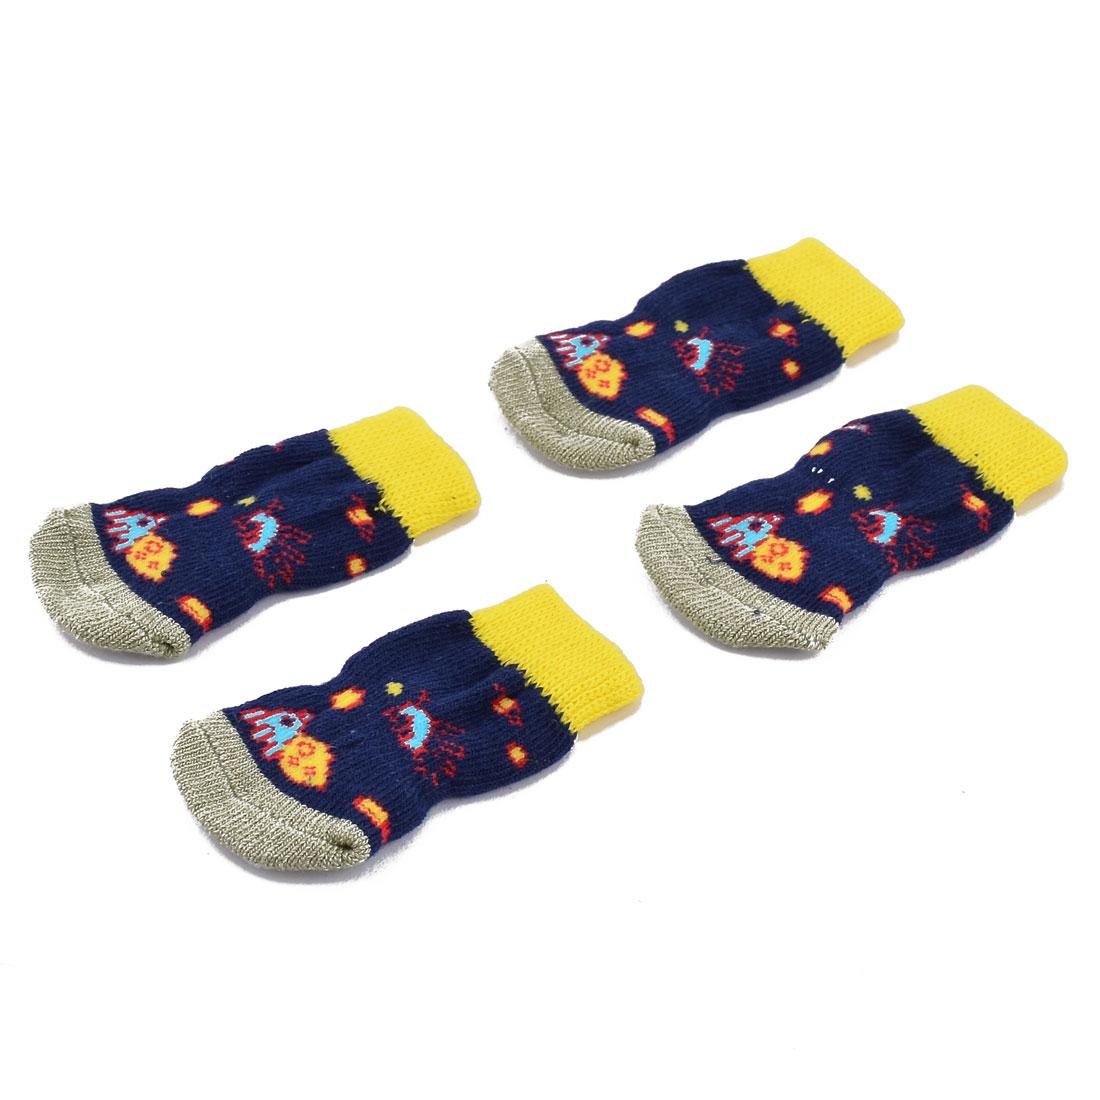 Outdoor Walking Pet Puppy Dog Cotton Elastic Breathable Anti-slip Sock Pair